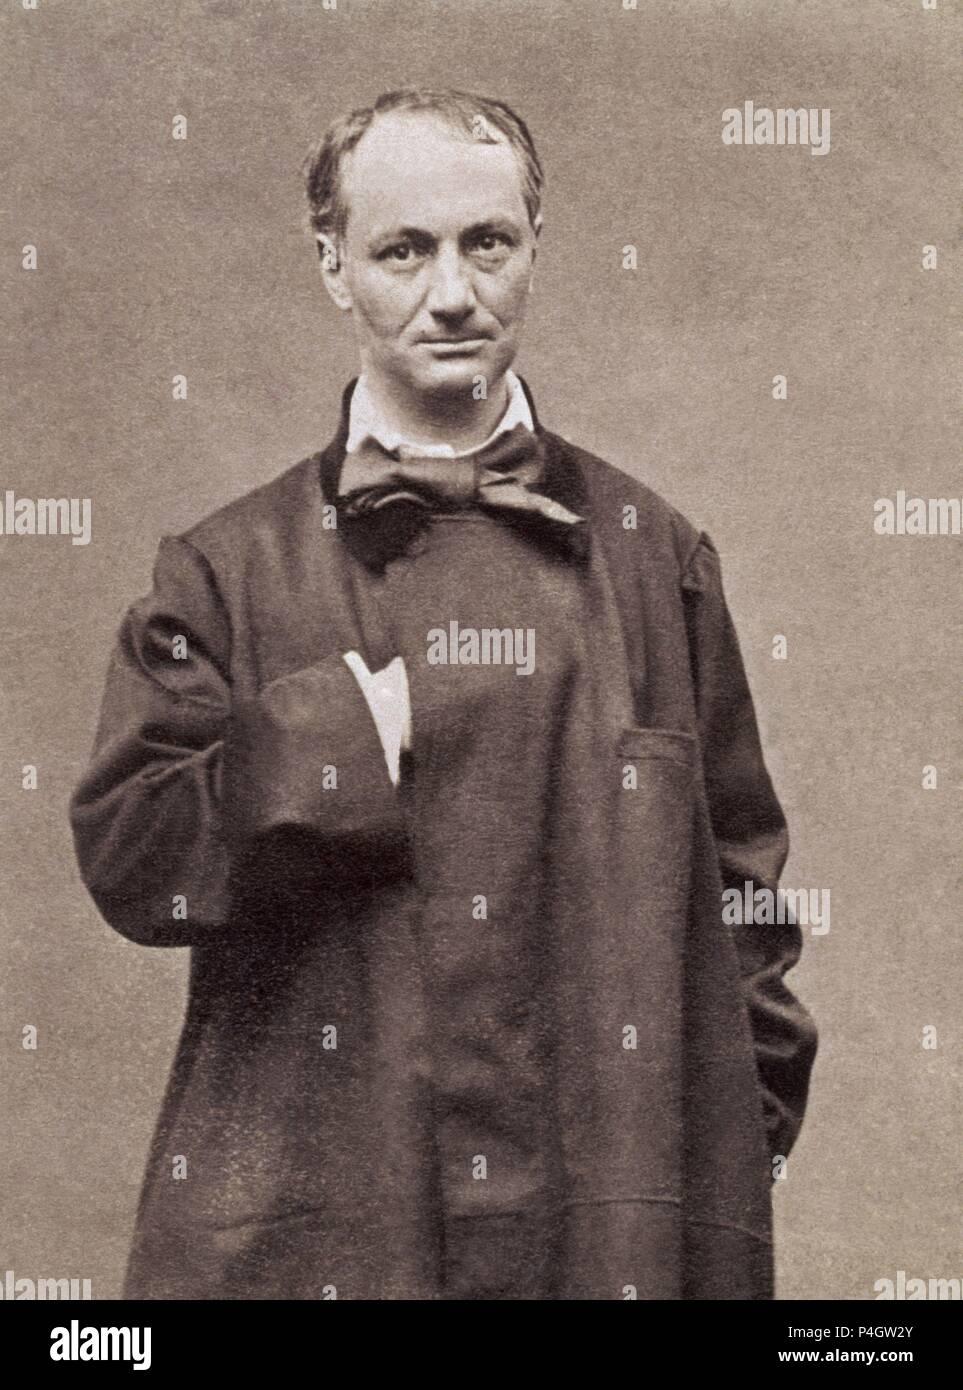 CHARLES BAUDELAIRE (1821-1867 Stock Photo - Alamy